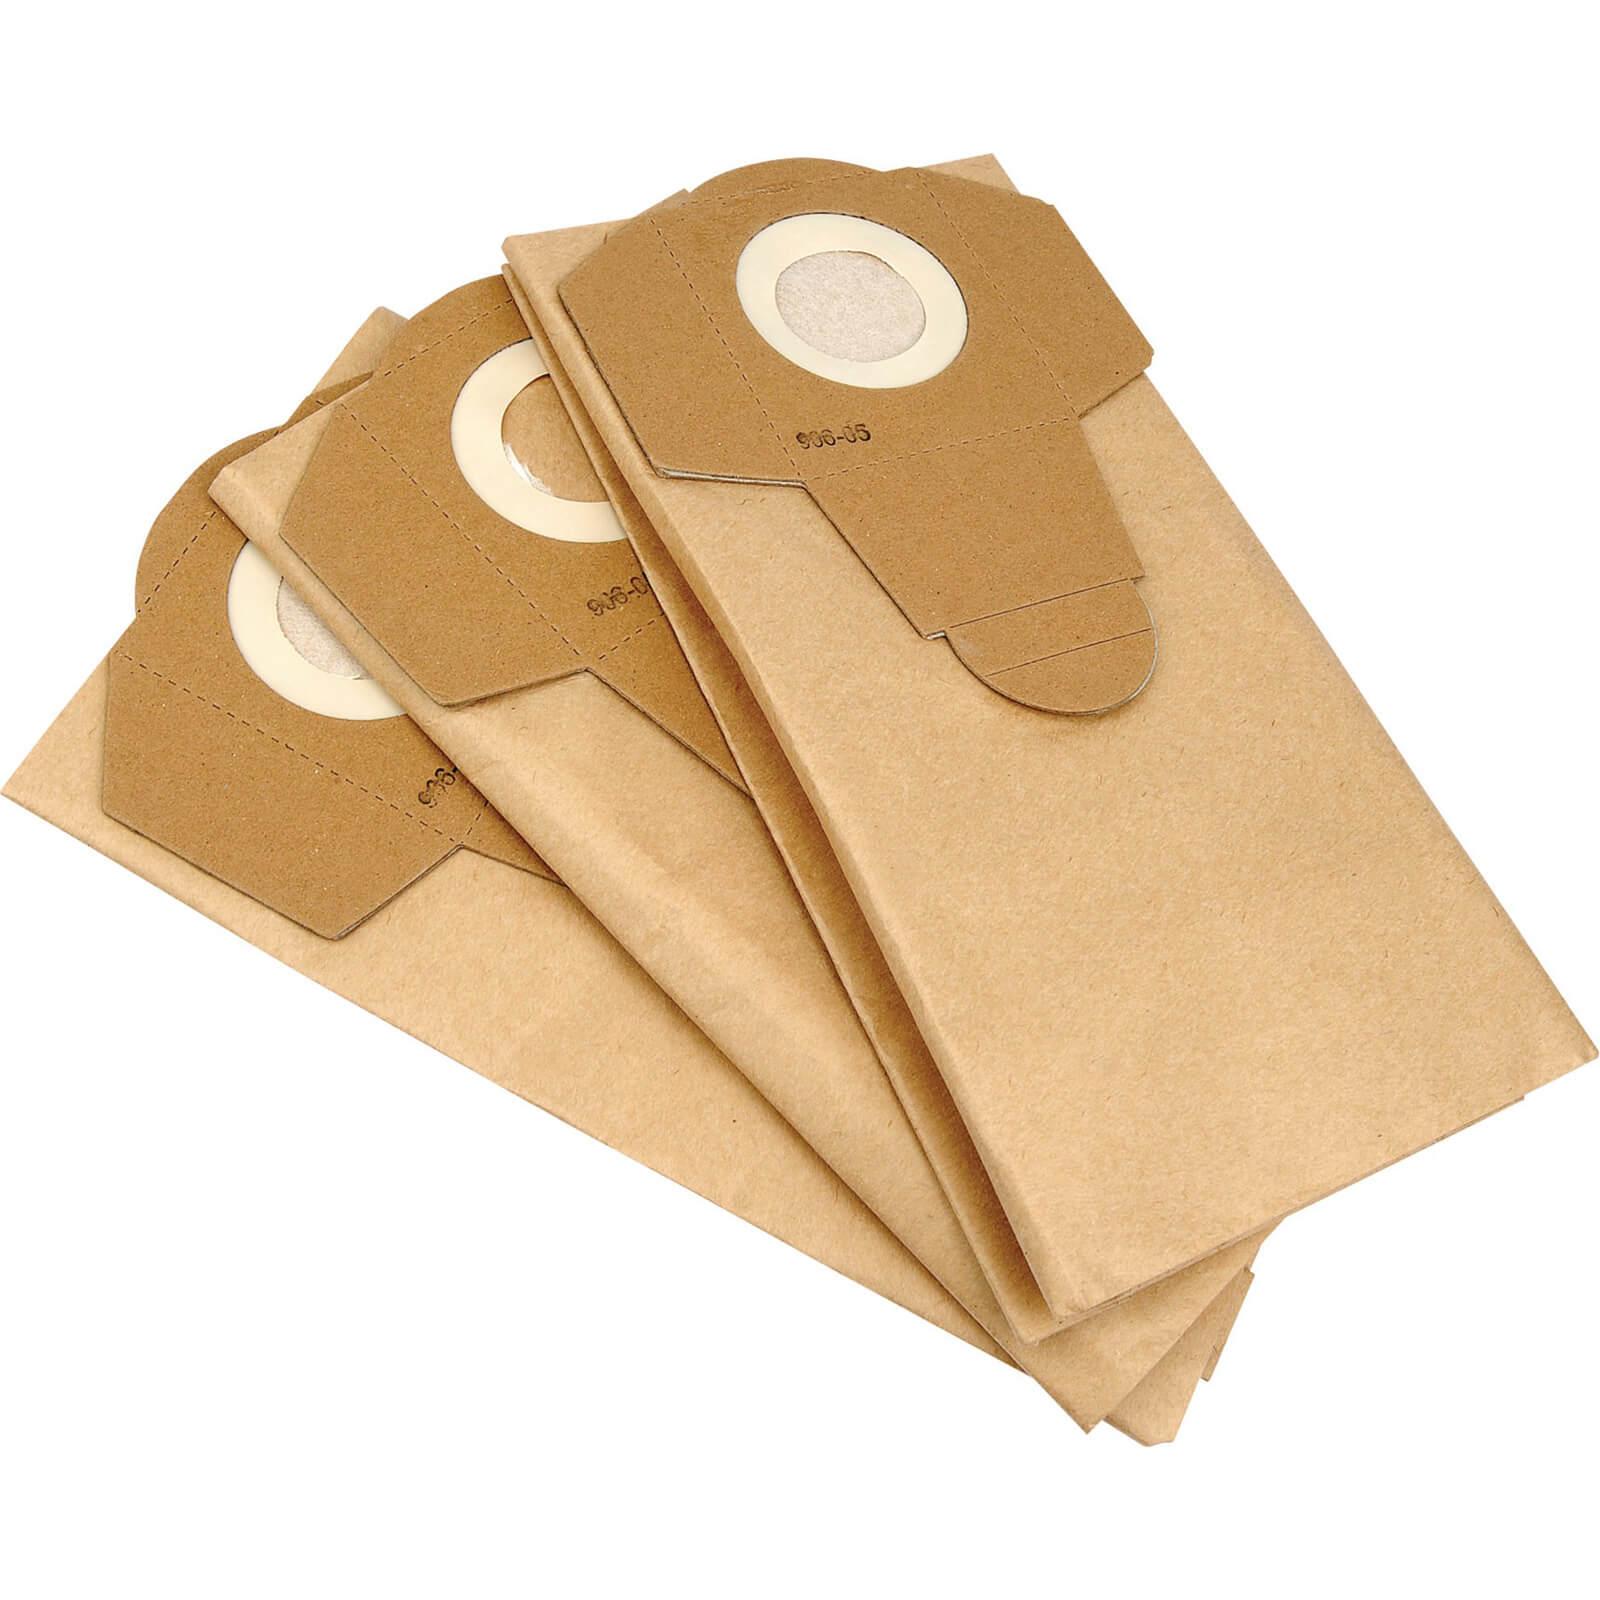 Draper Paper Dust Bags for 13785 Vacuum Cleaner Pack of 3